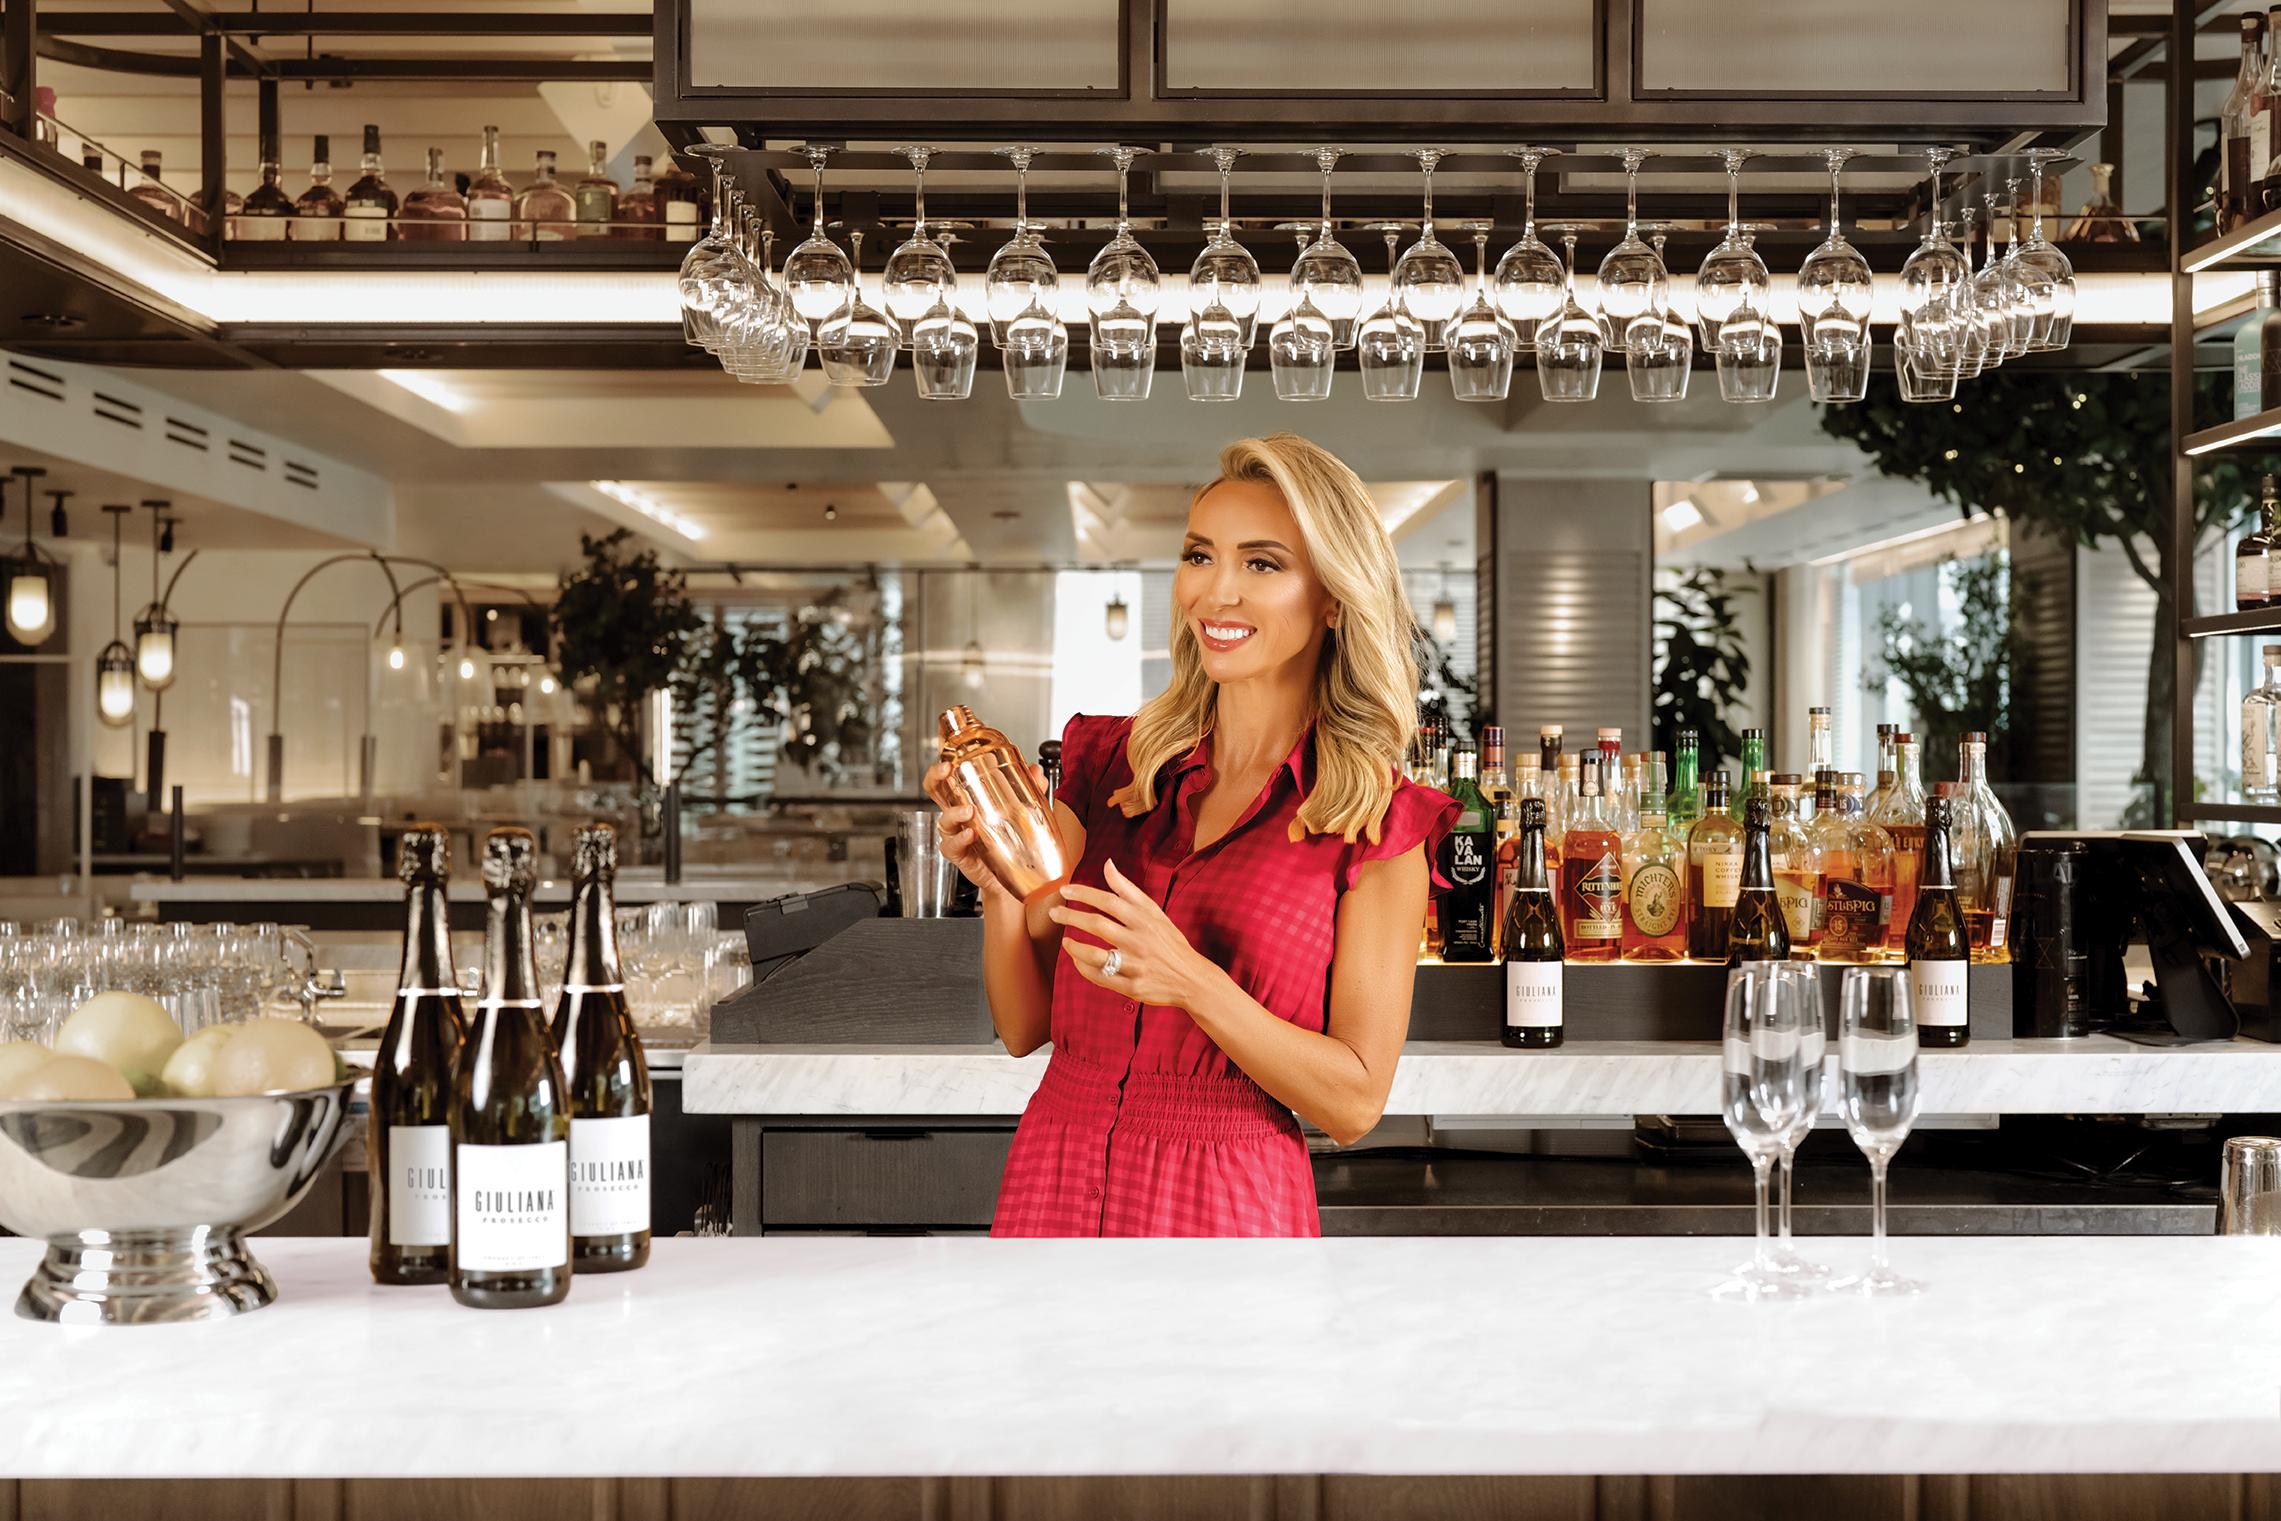 Giuliana Rancic standing behind a bar mixing a drink.